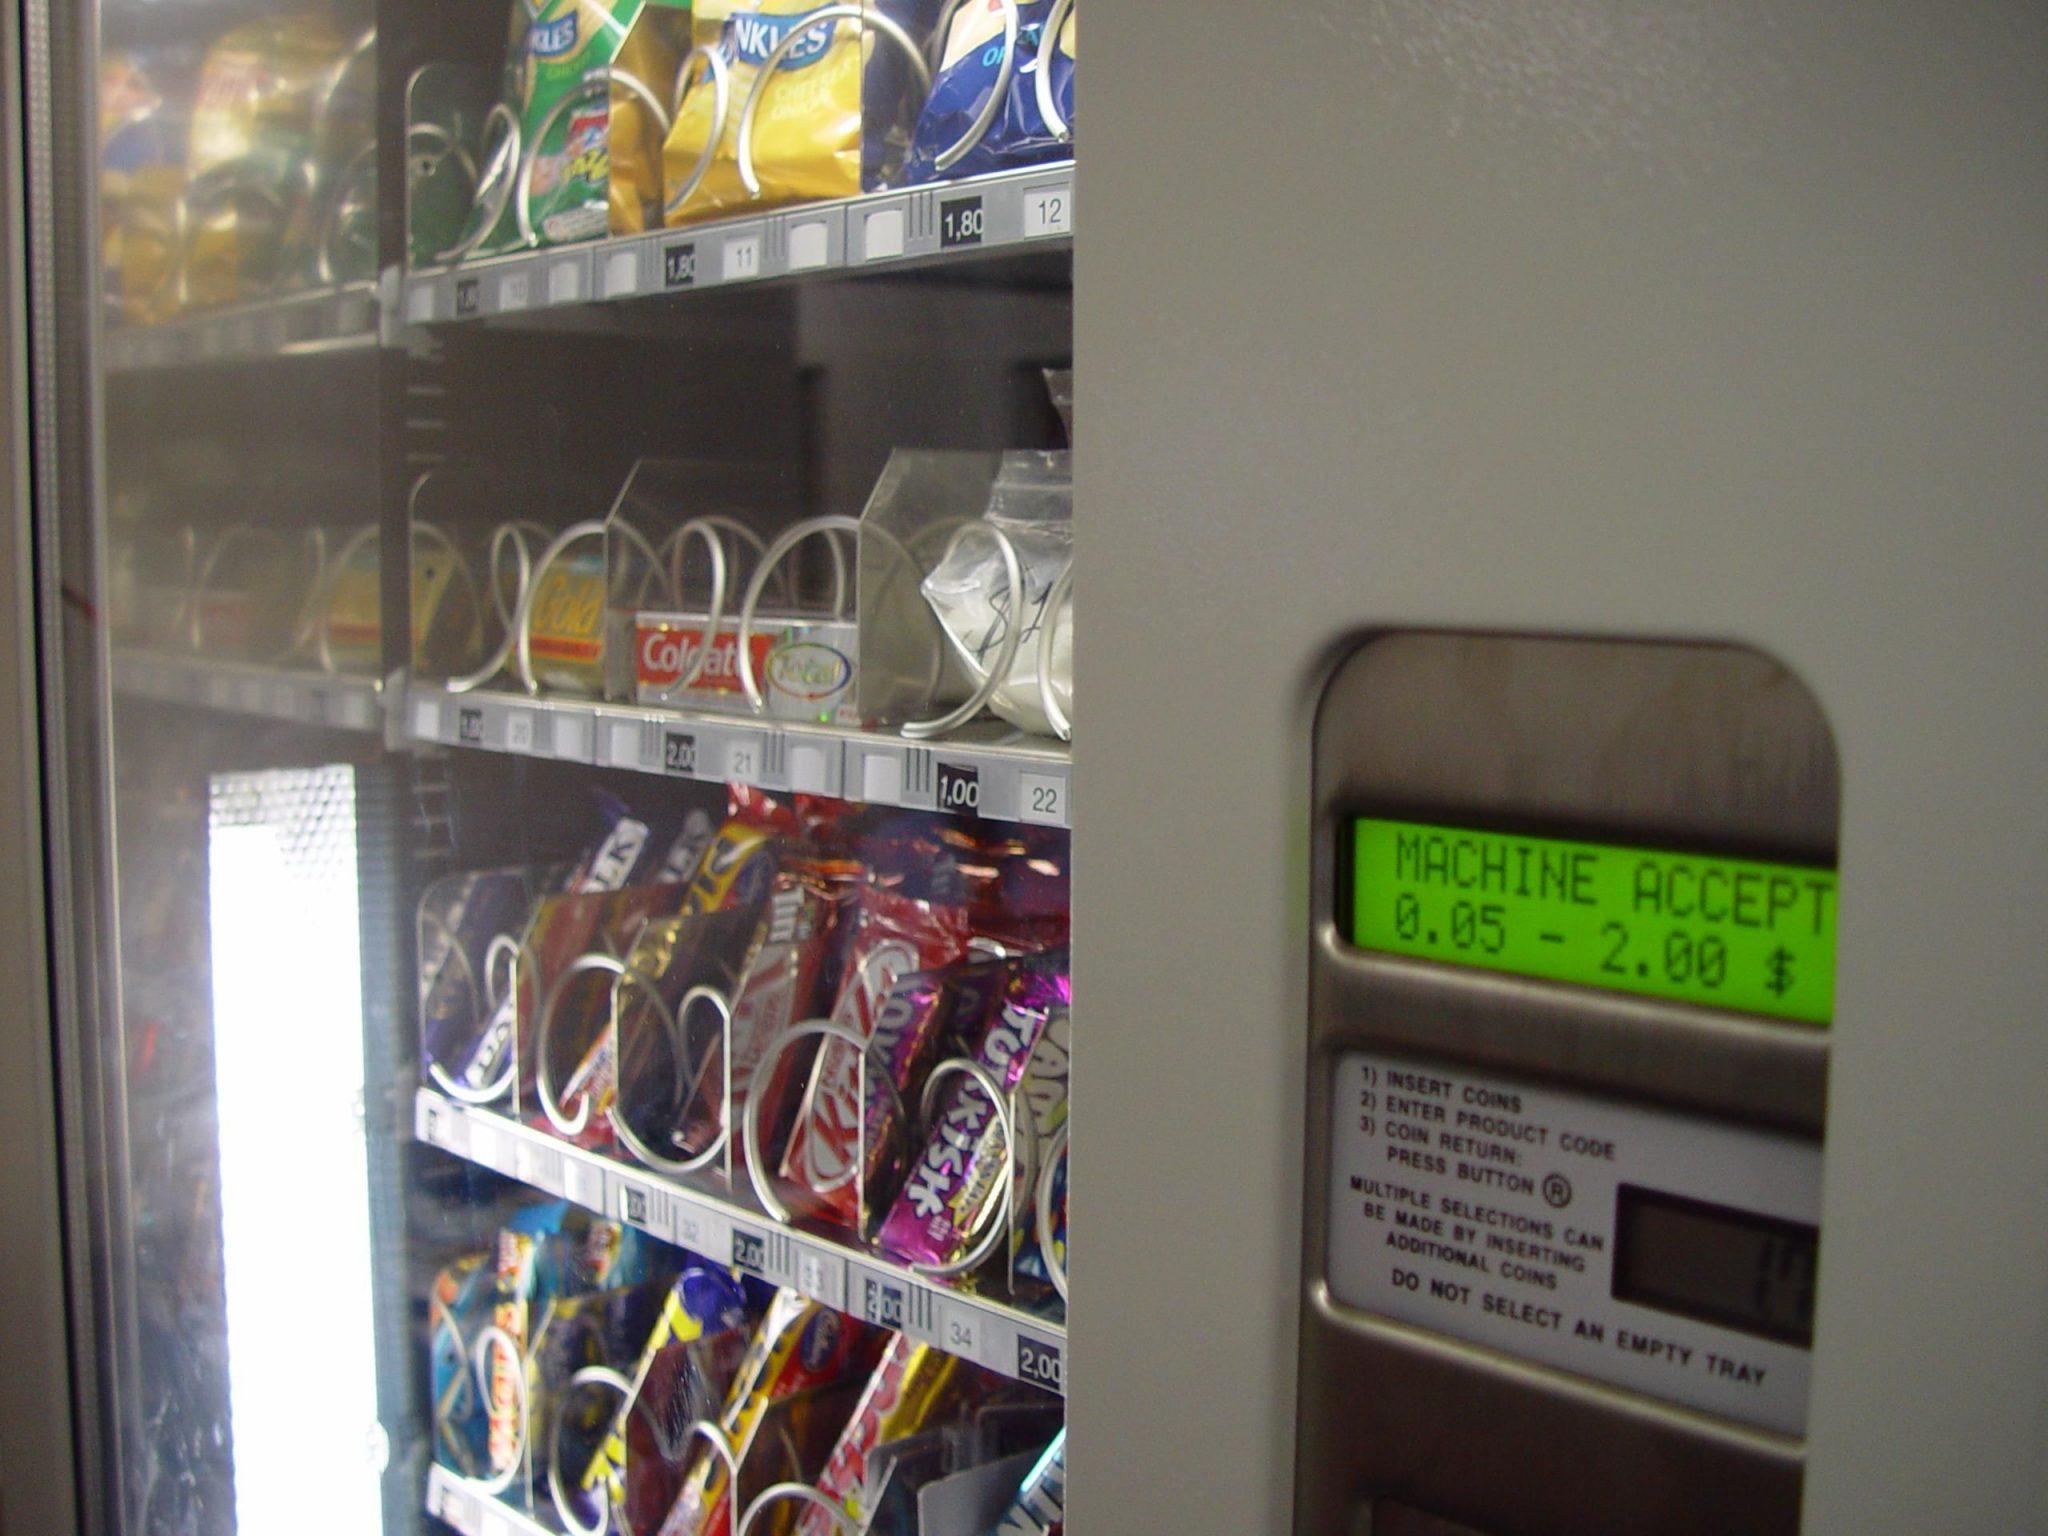 Howard County Seeking Healthier Vending Machines